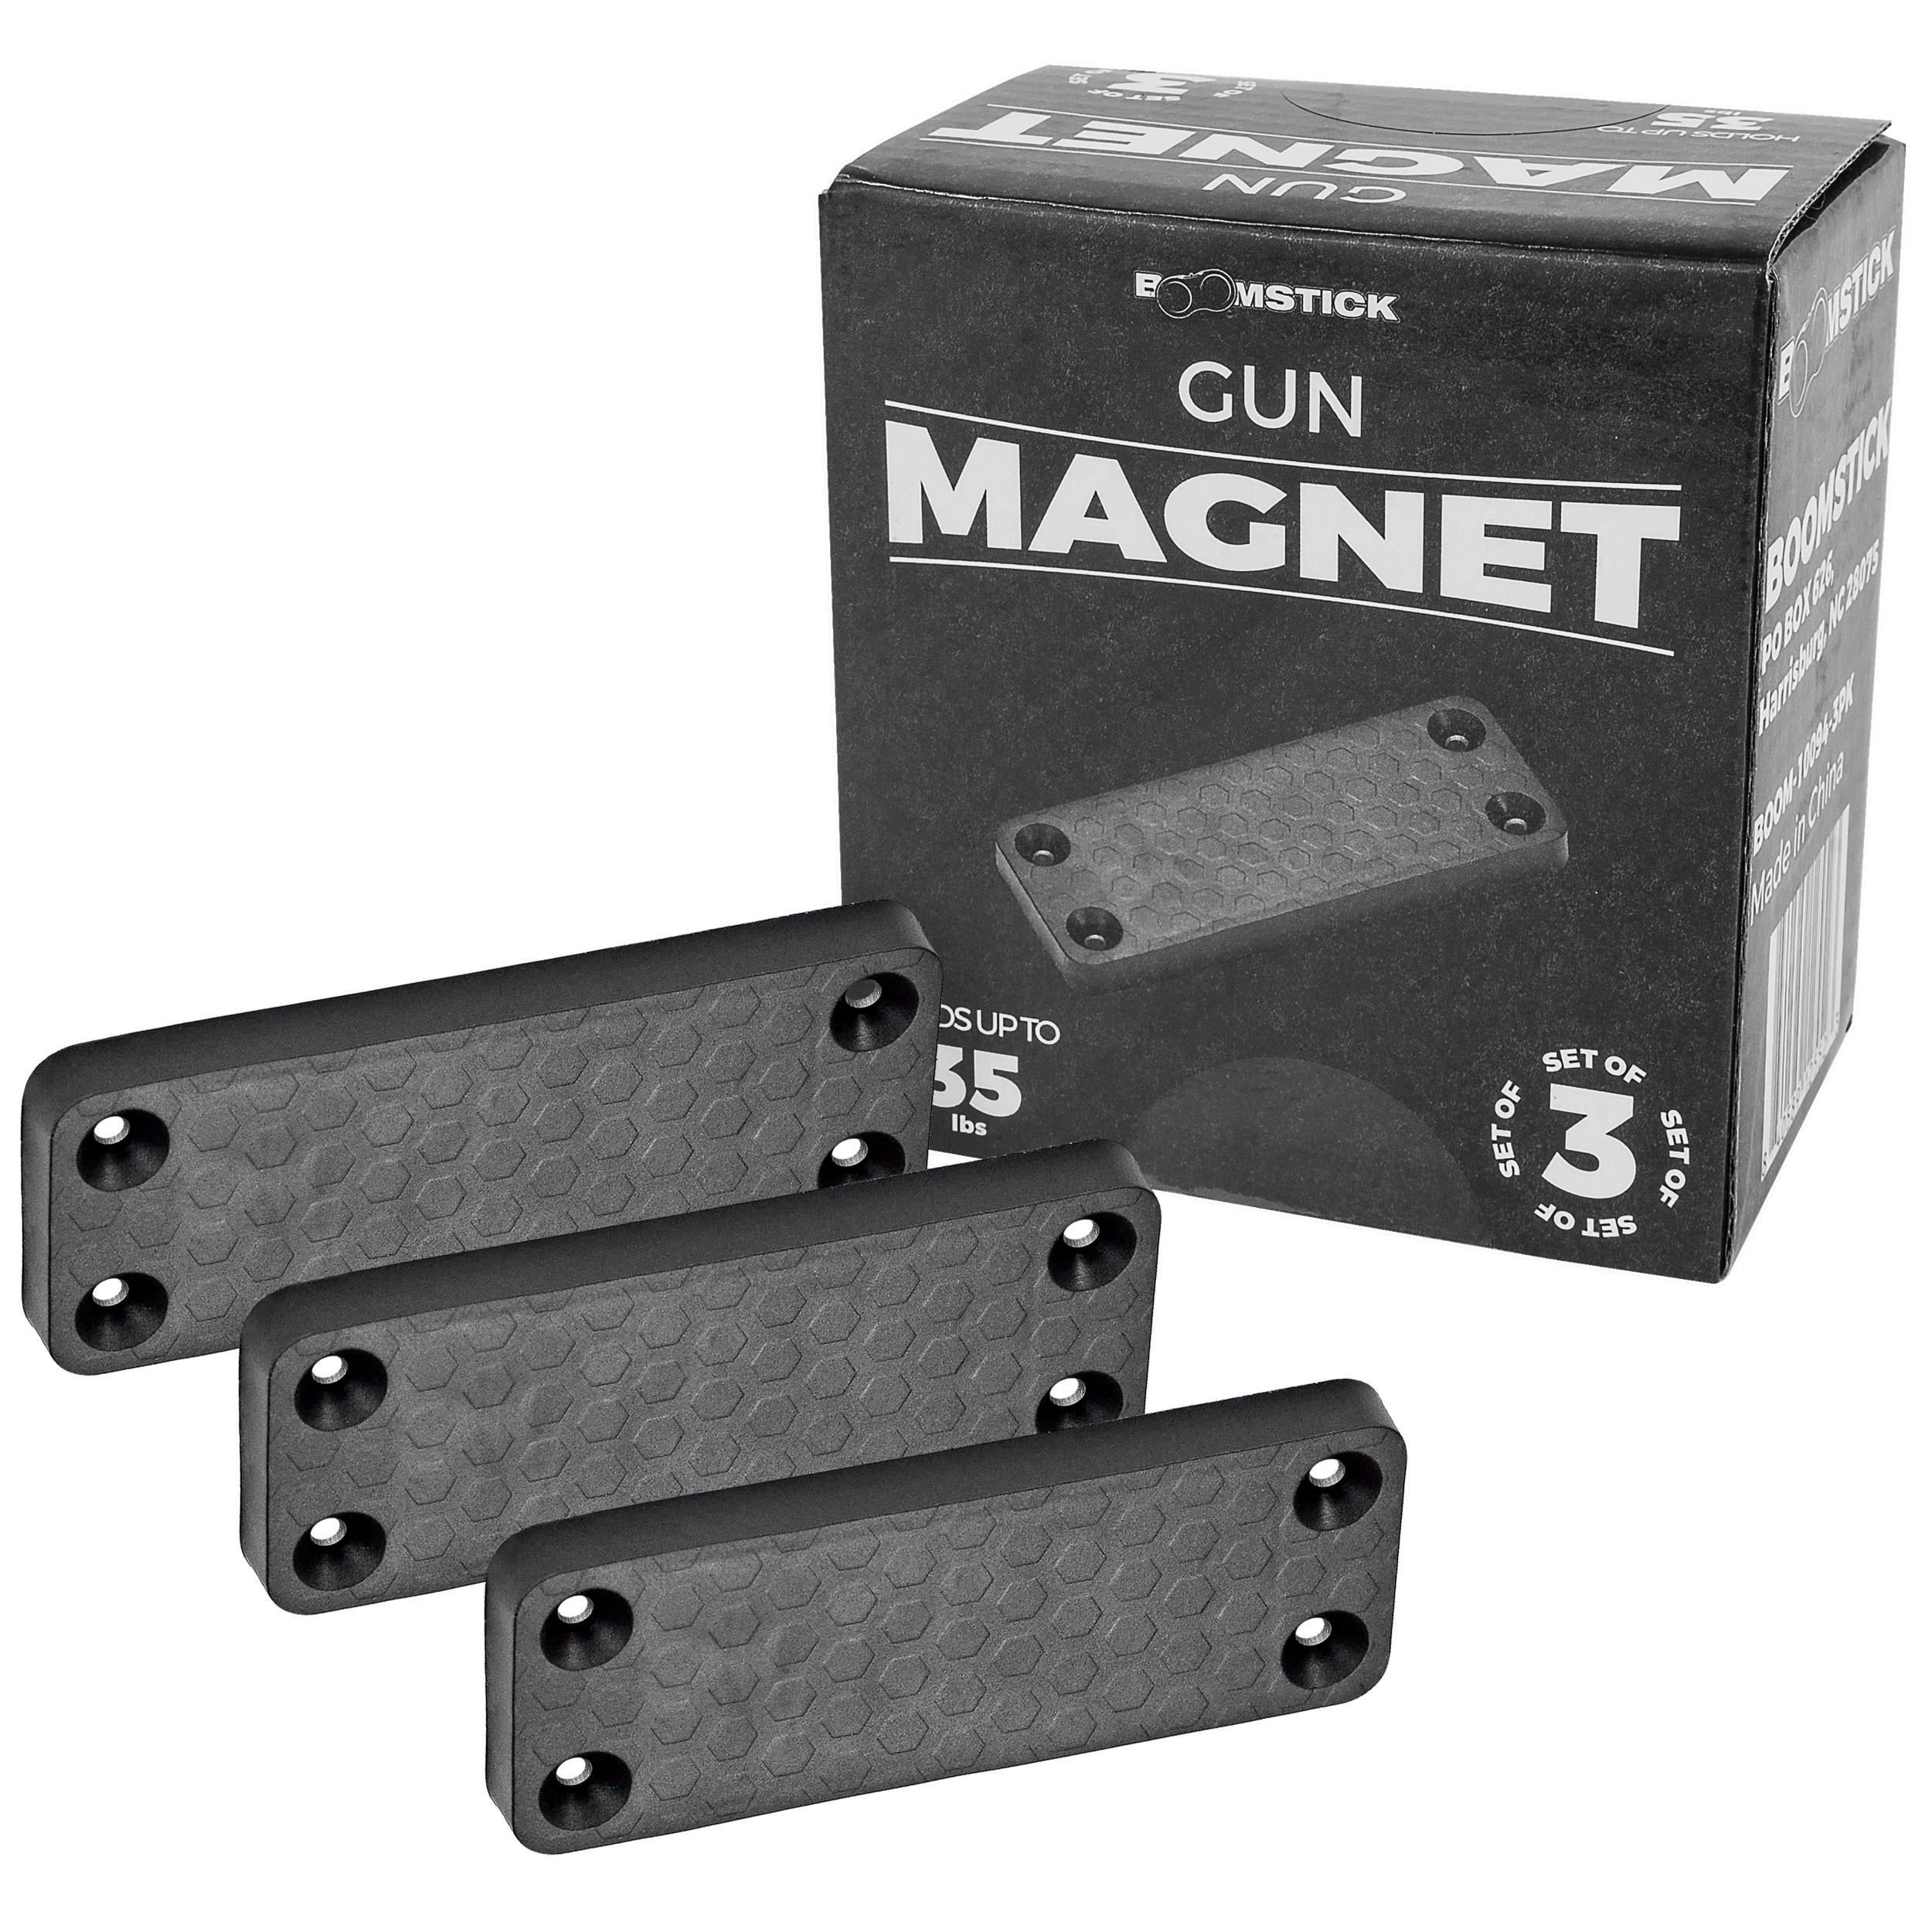 Gun Magnet 35lb 3 Pack